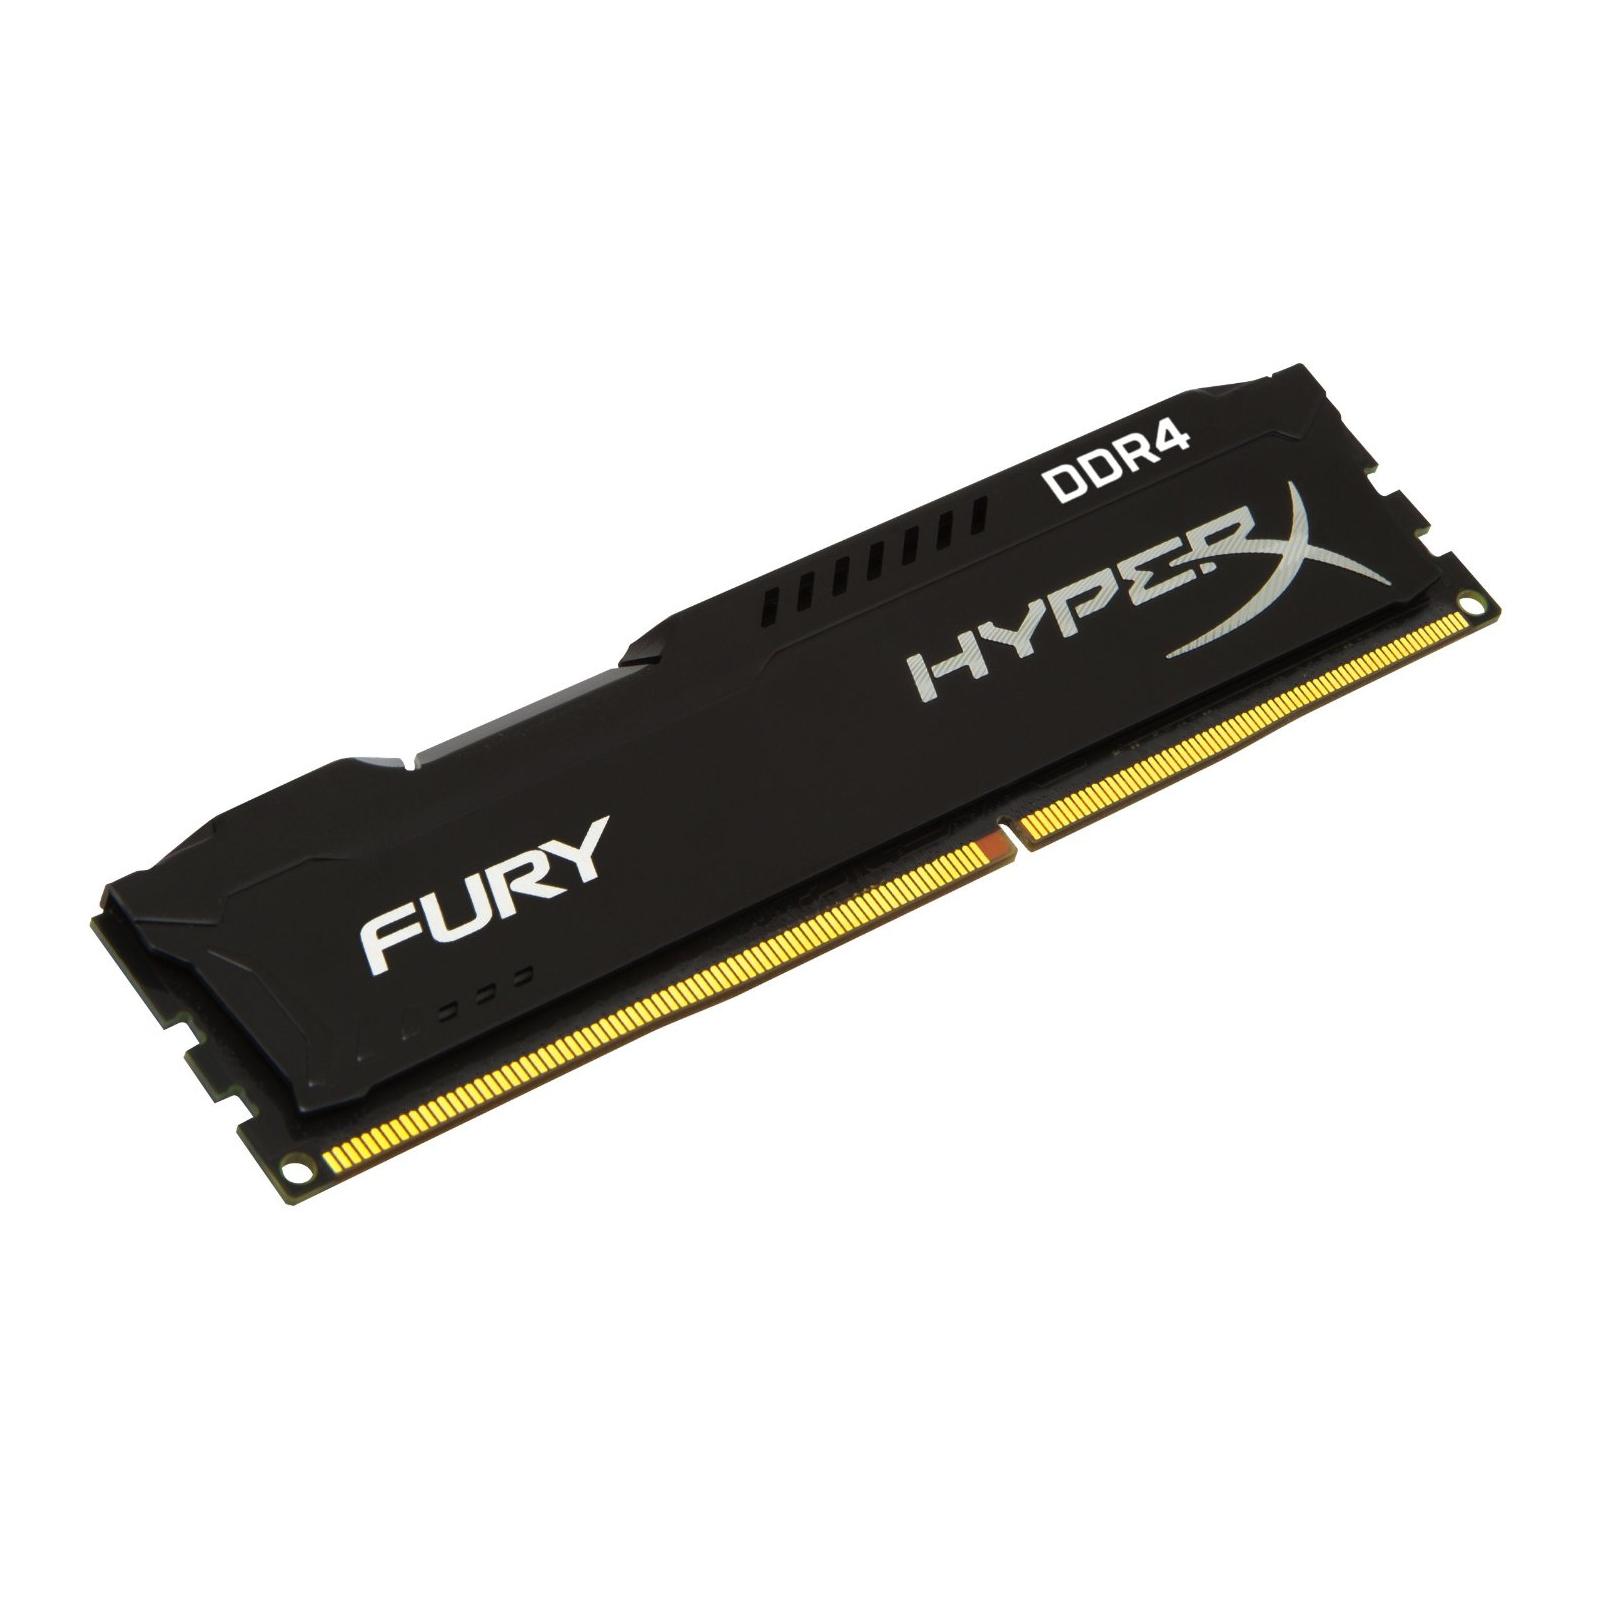 Модуль памяти для компьютера DDR4 16GB 2133 MHz Fury Blac Kingston (HX421C14FB/16) изображение 2